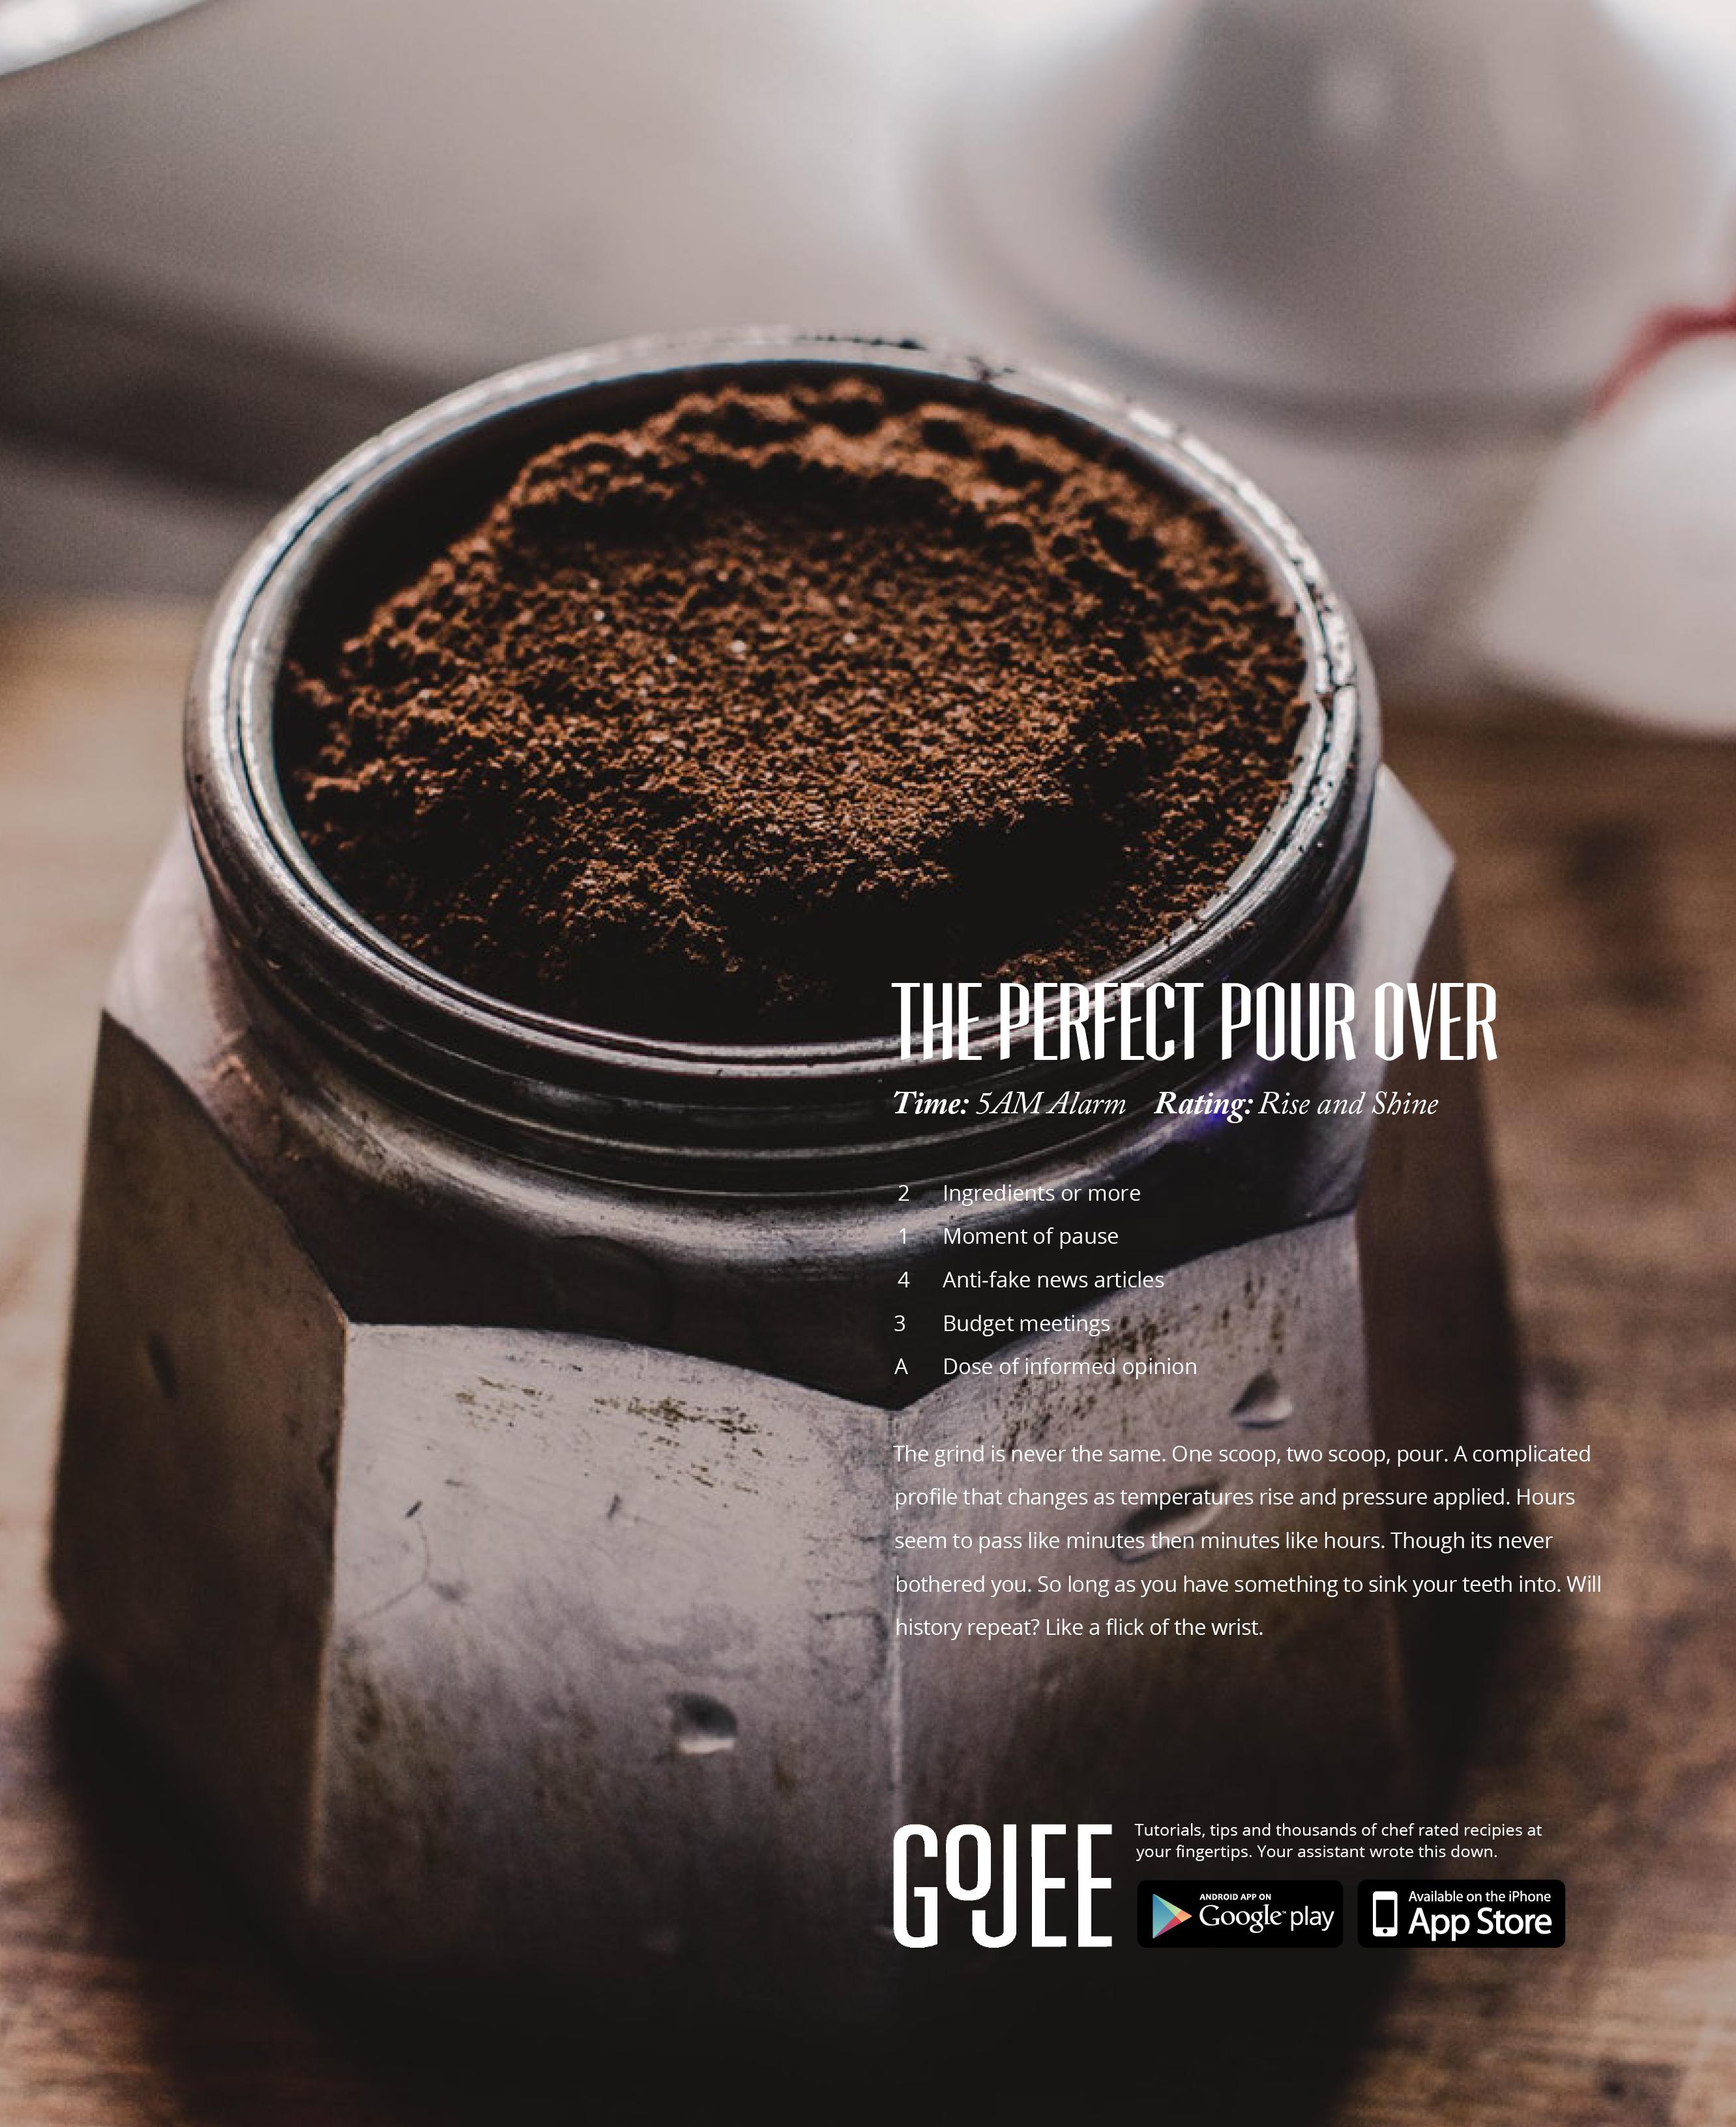 Gojee Magazine Ad, Additional Persona - Coffee